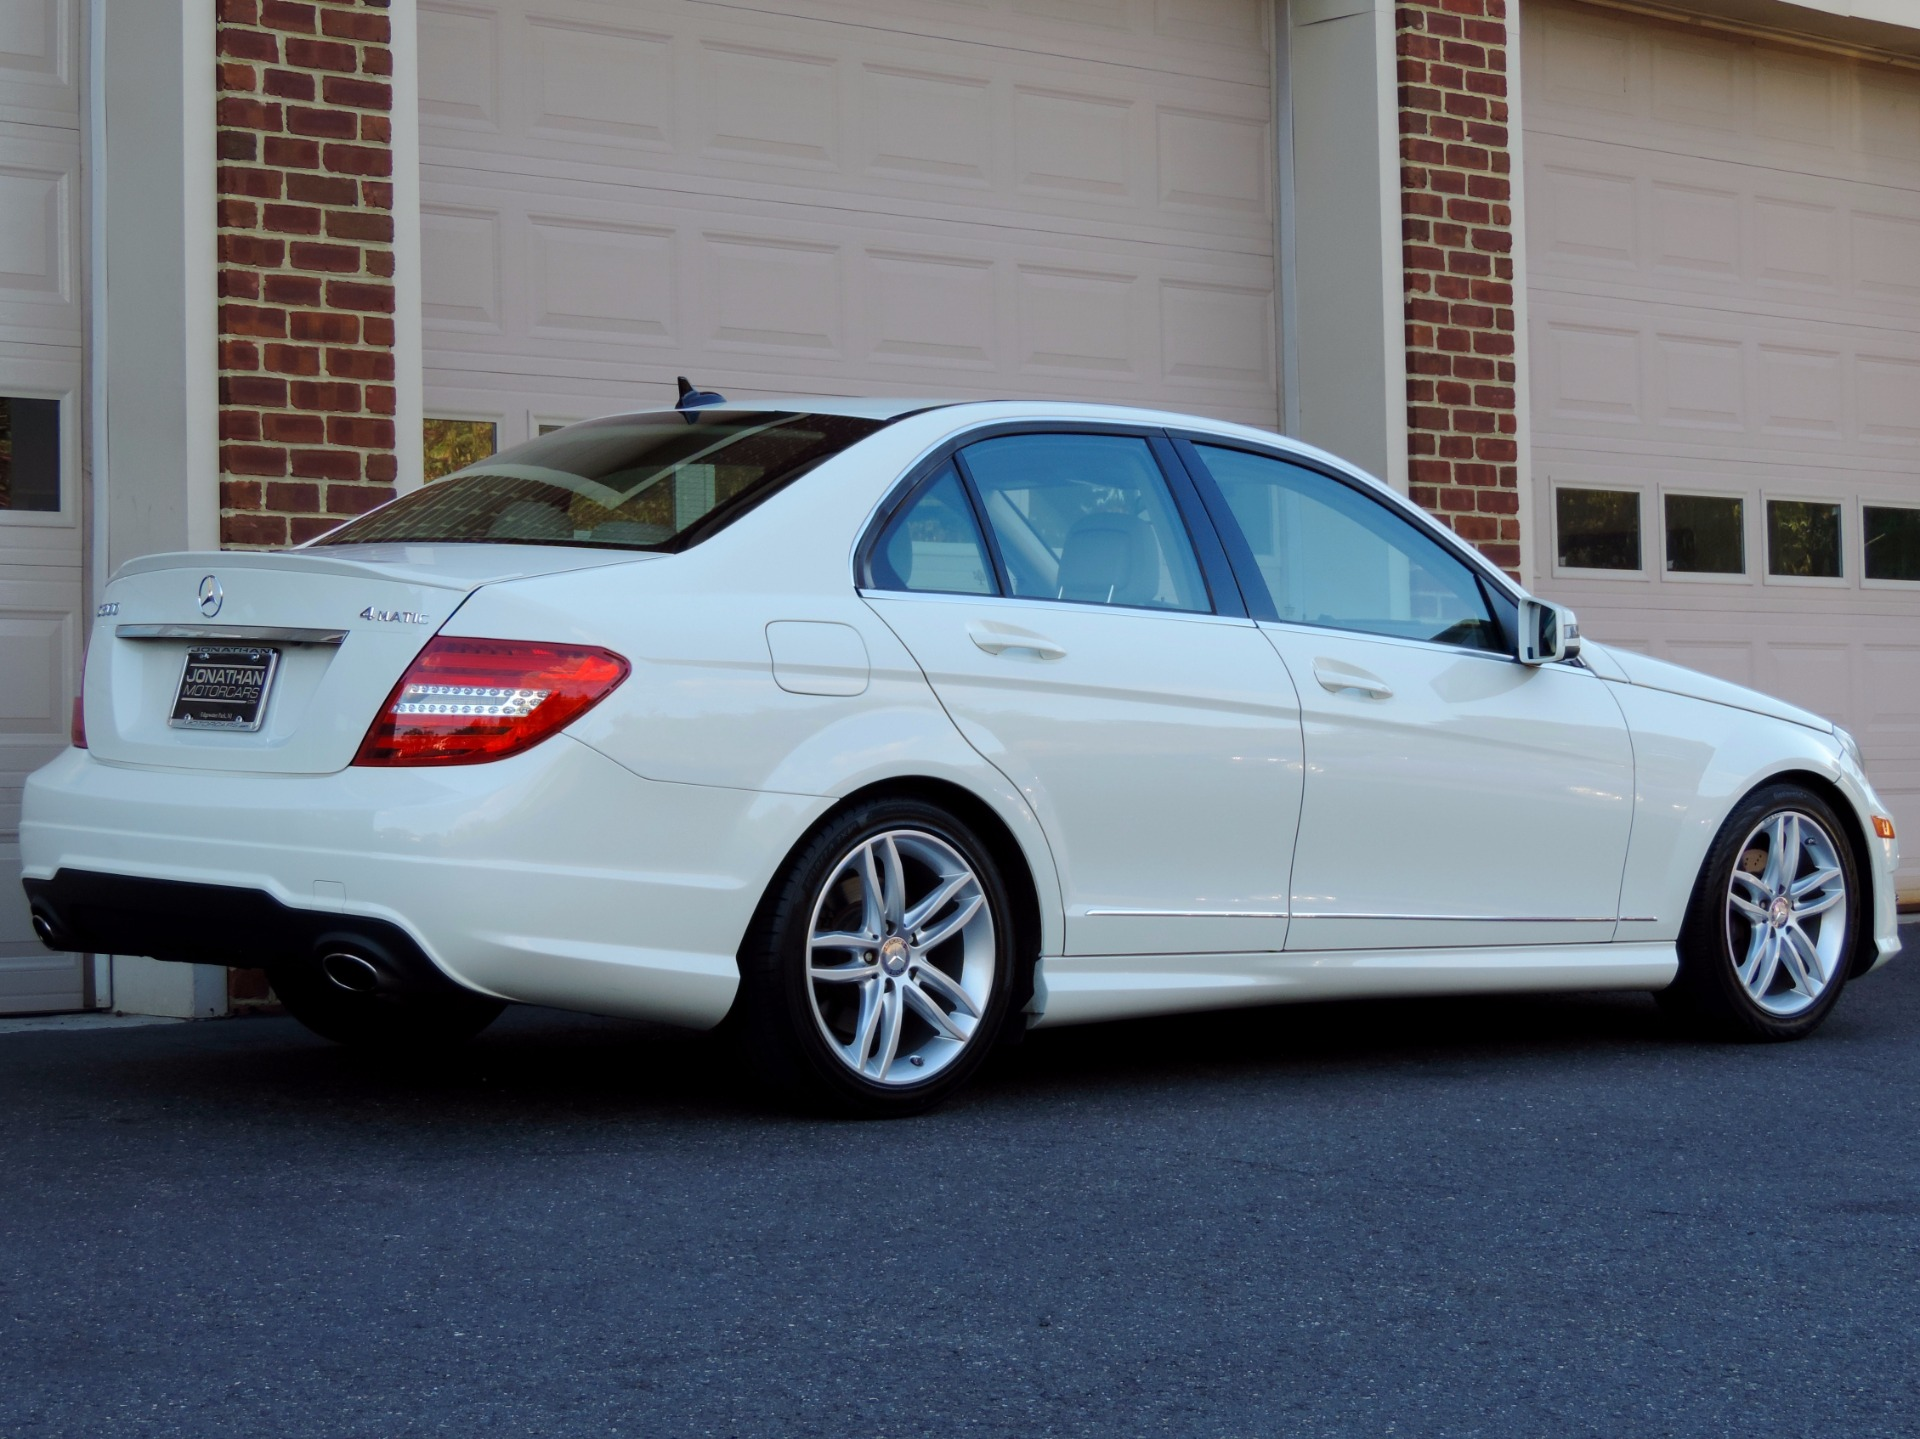 2012 mercedes benz c class c 300 sport 4matic stock for Mercedes benz c300 for sale nj